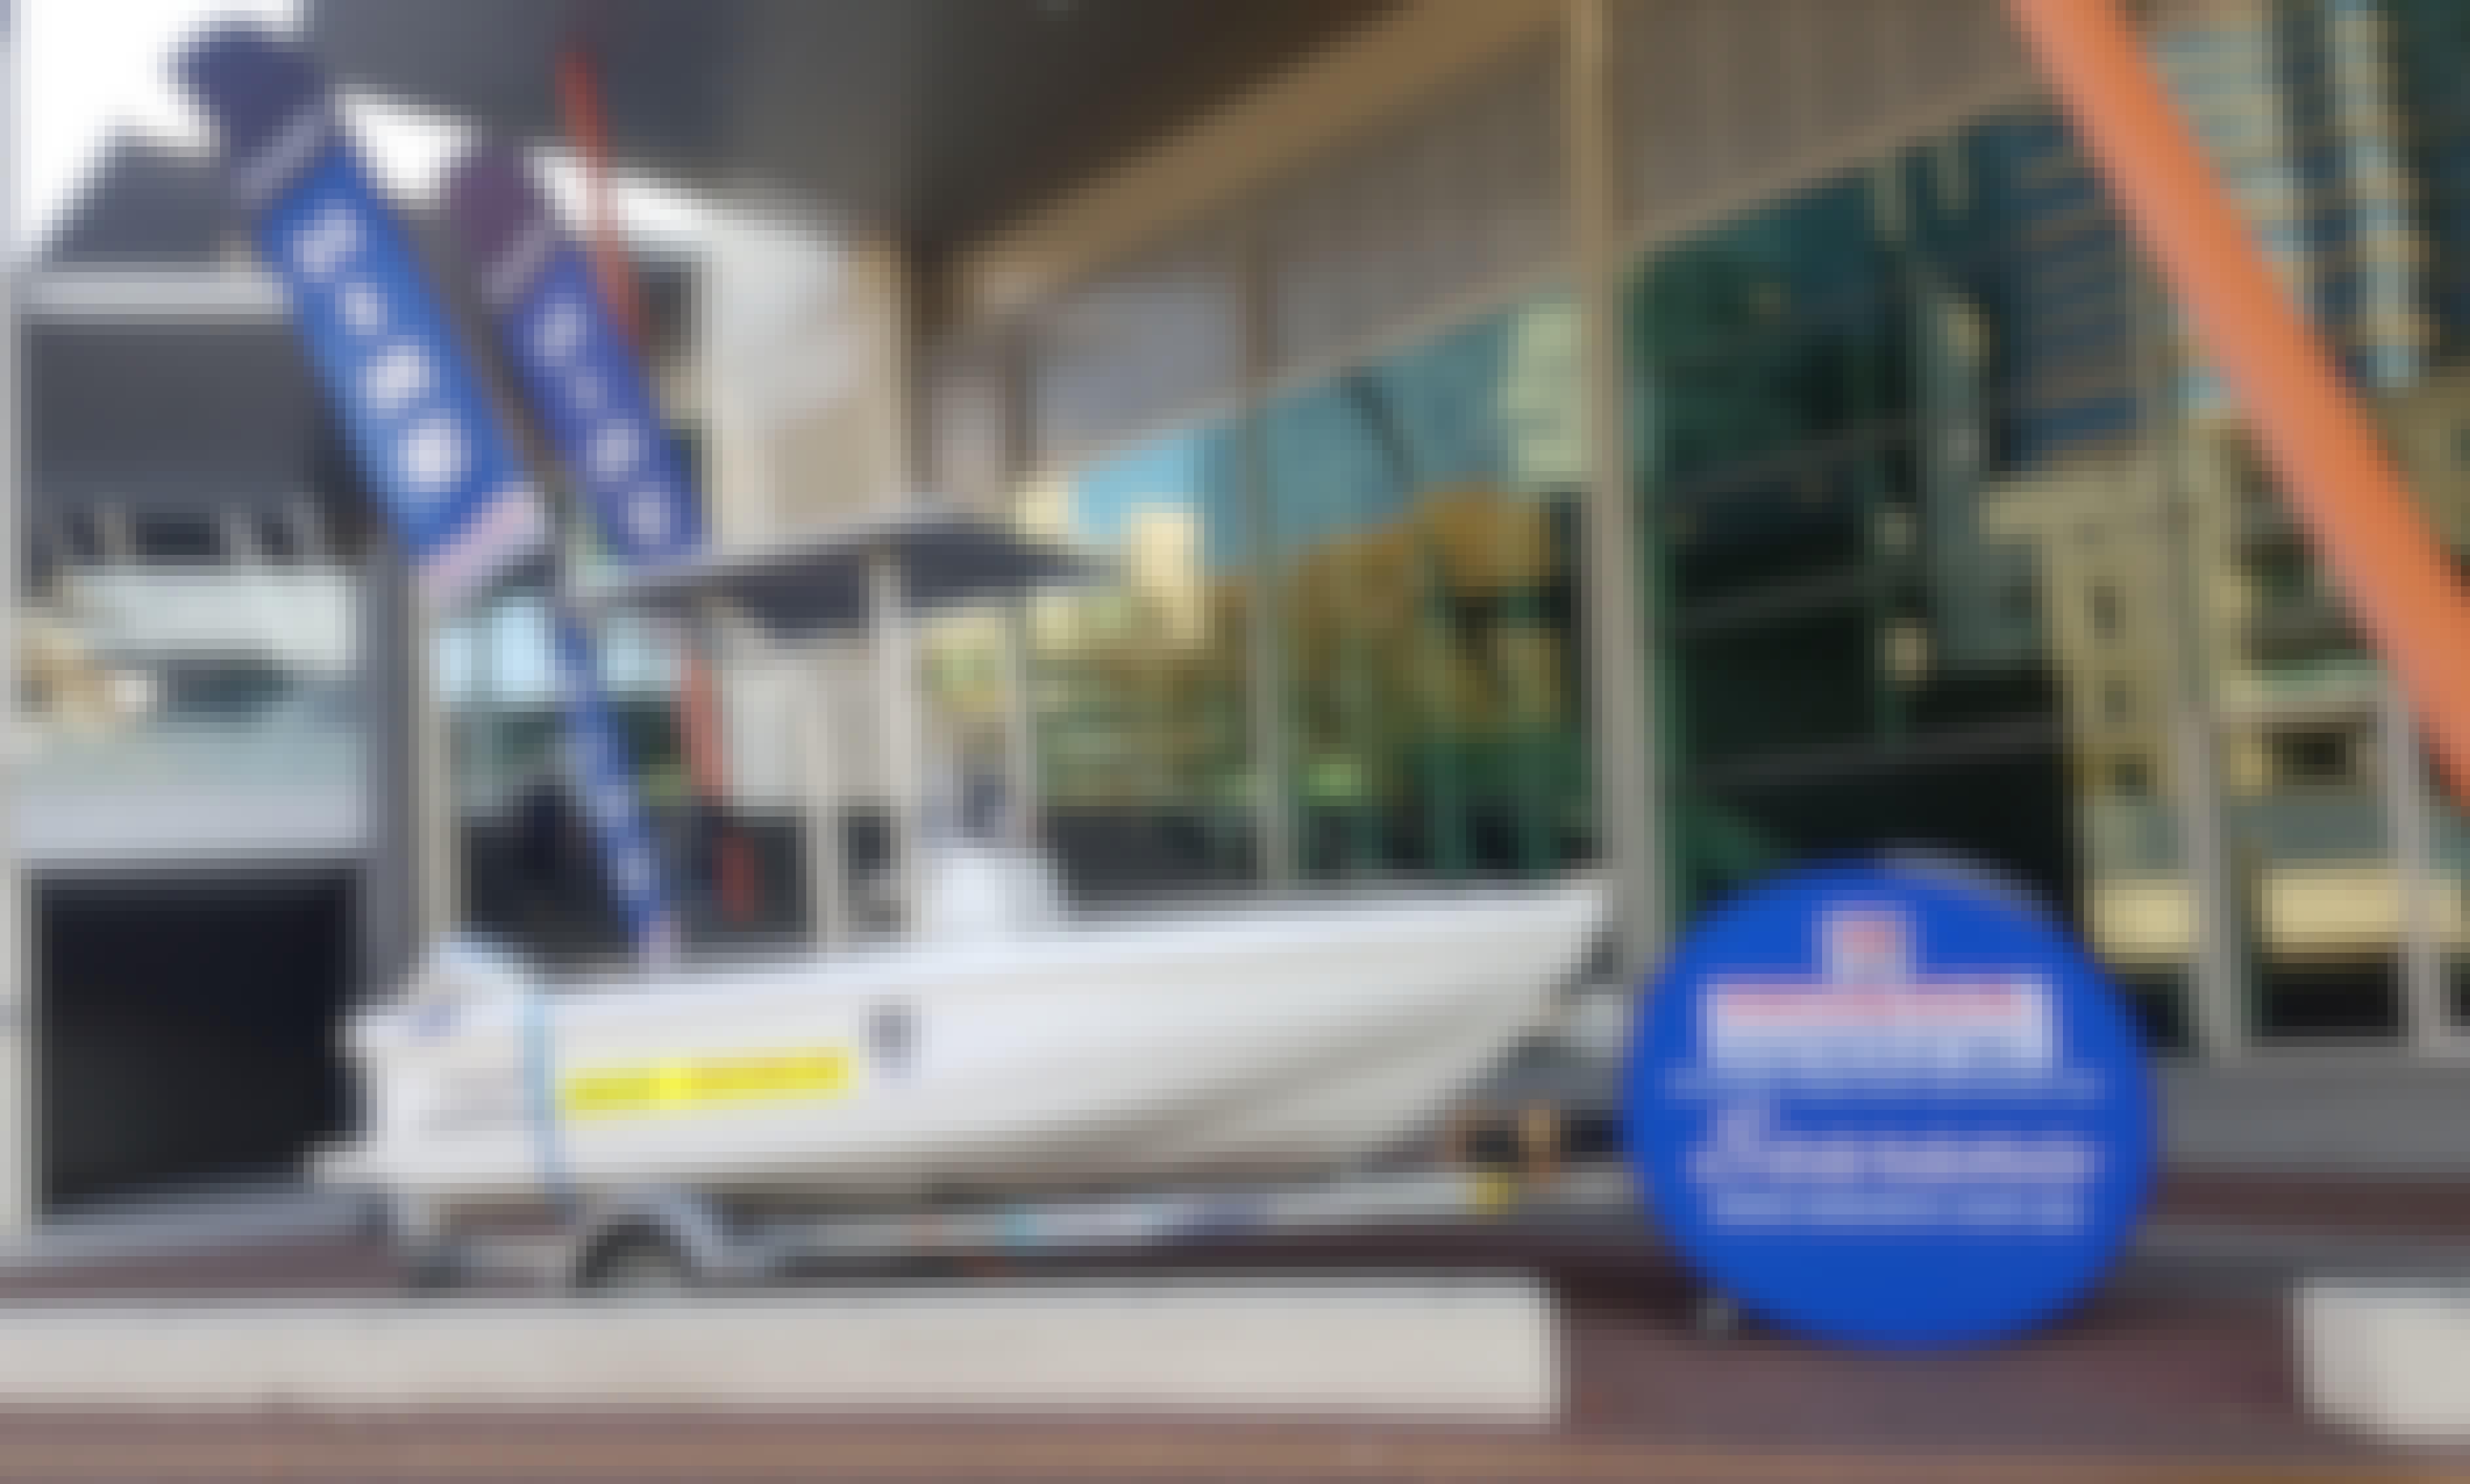 Hire Selfdrive Polyethylene Boat for 4 People in Malaga, Western Australia